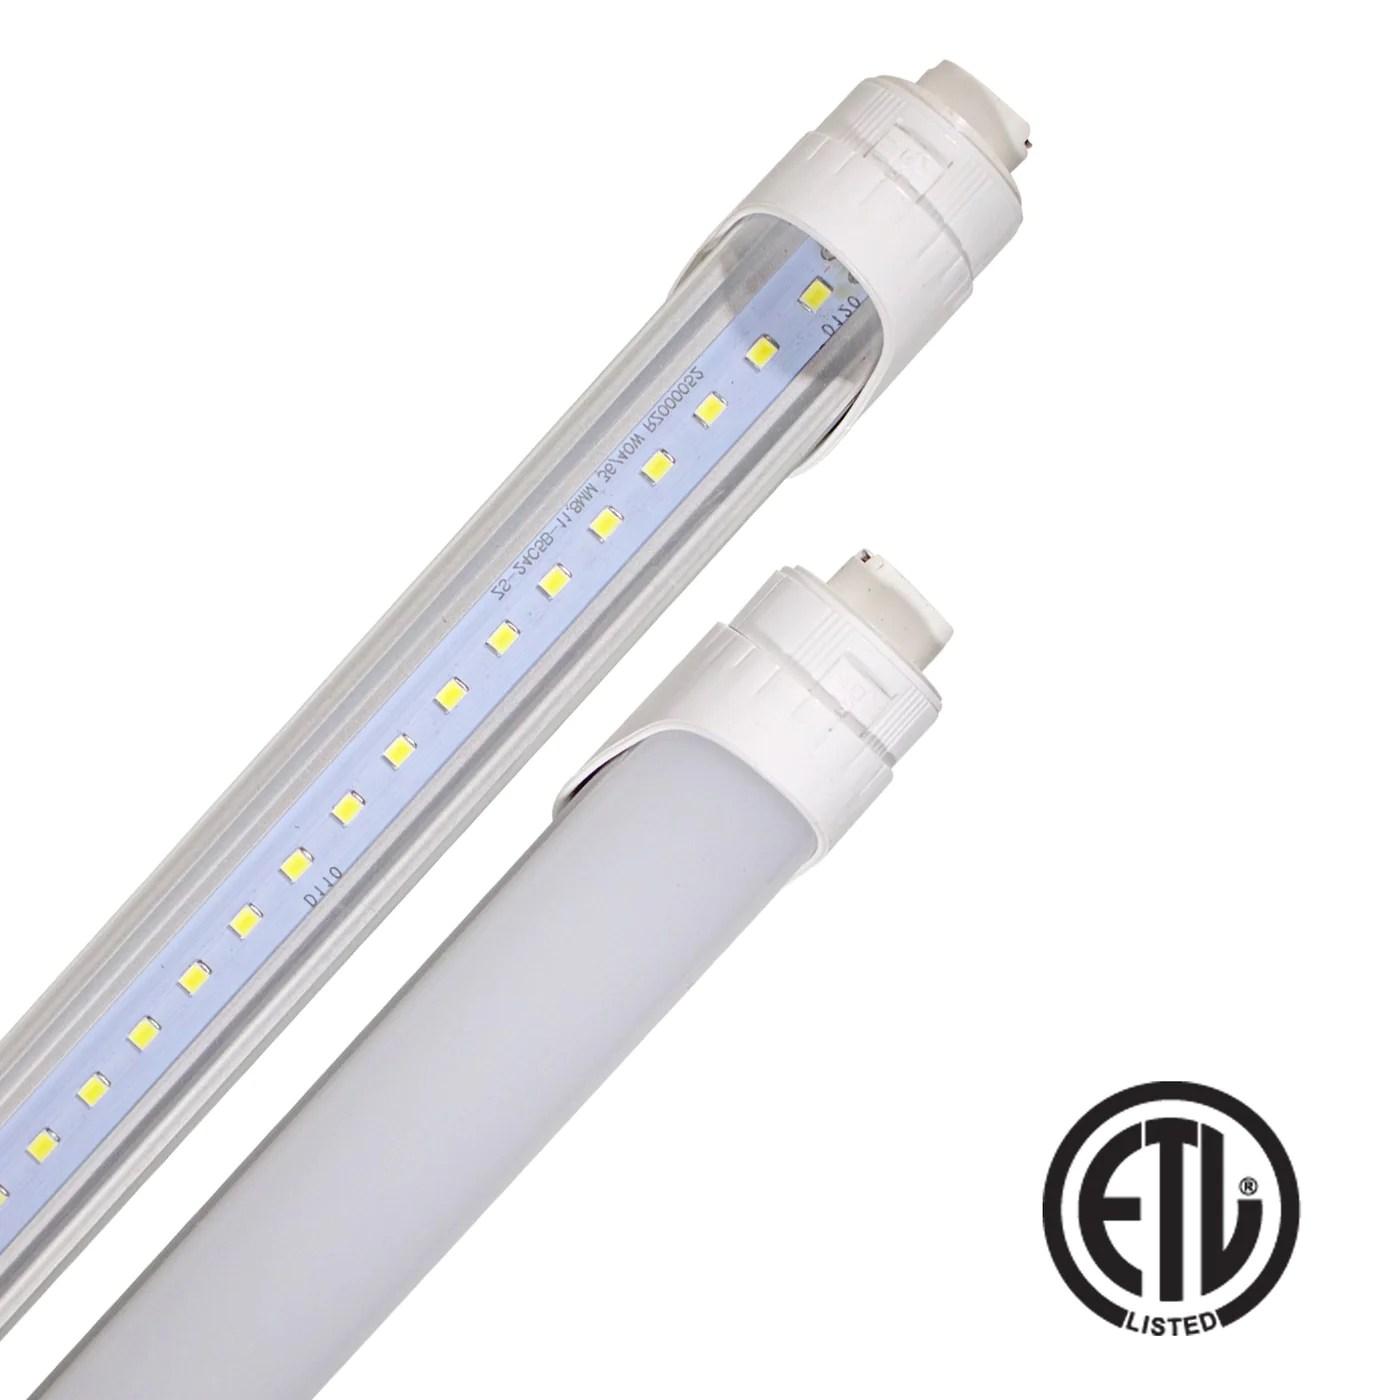 8 foot fluorescent light wiring diagram [ 1400 x 1400 Pixel ]